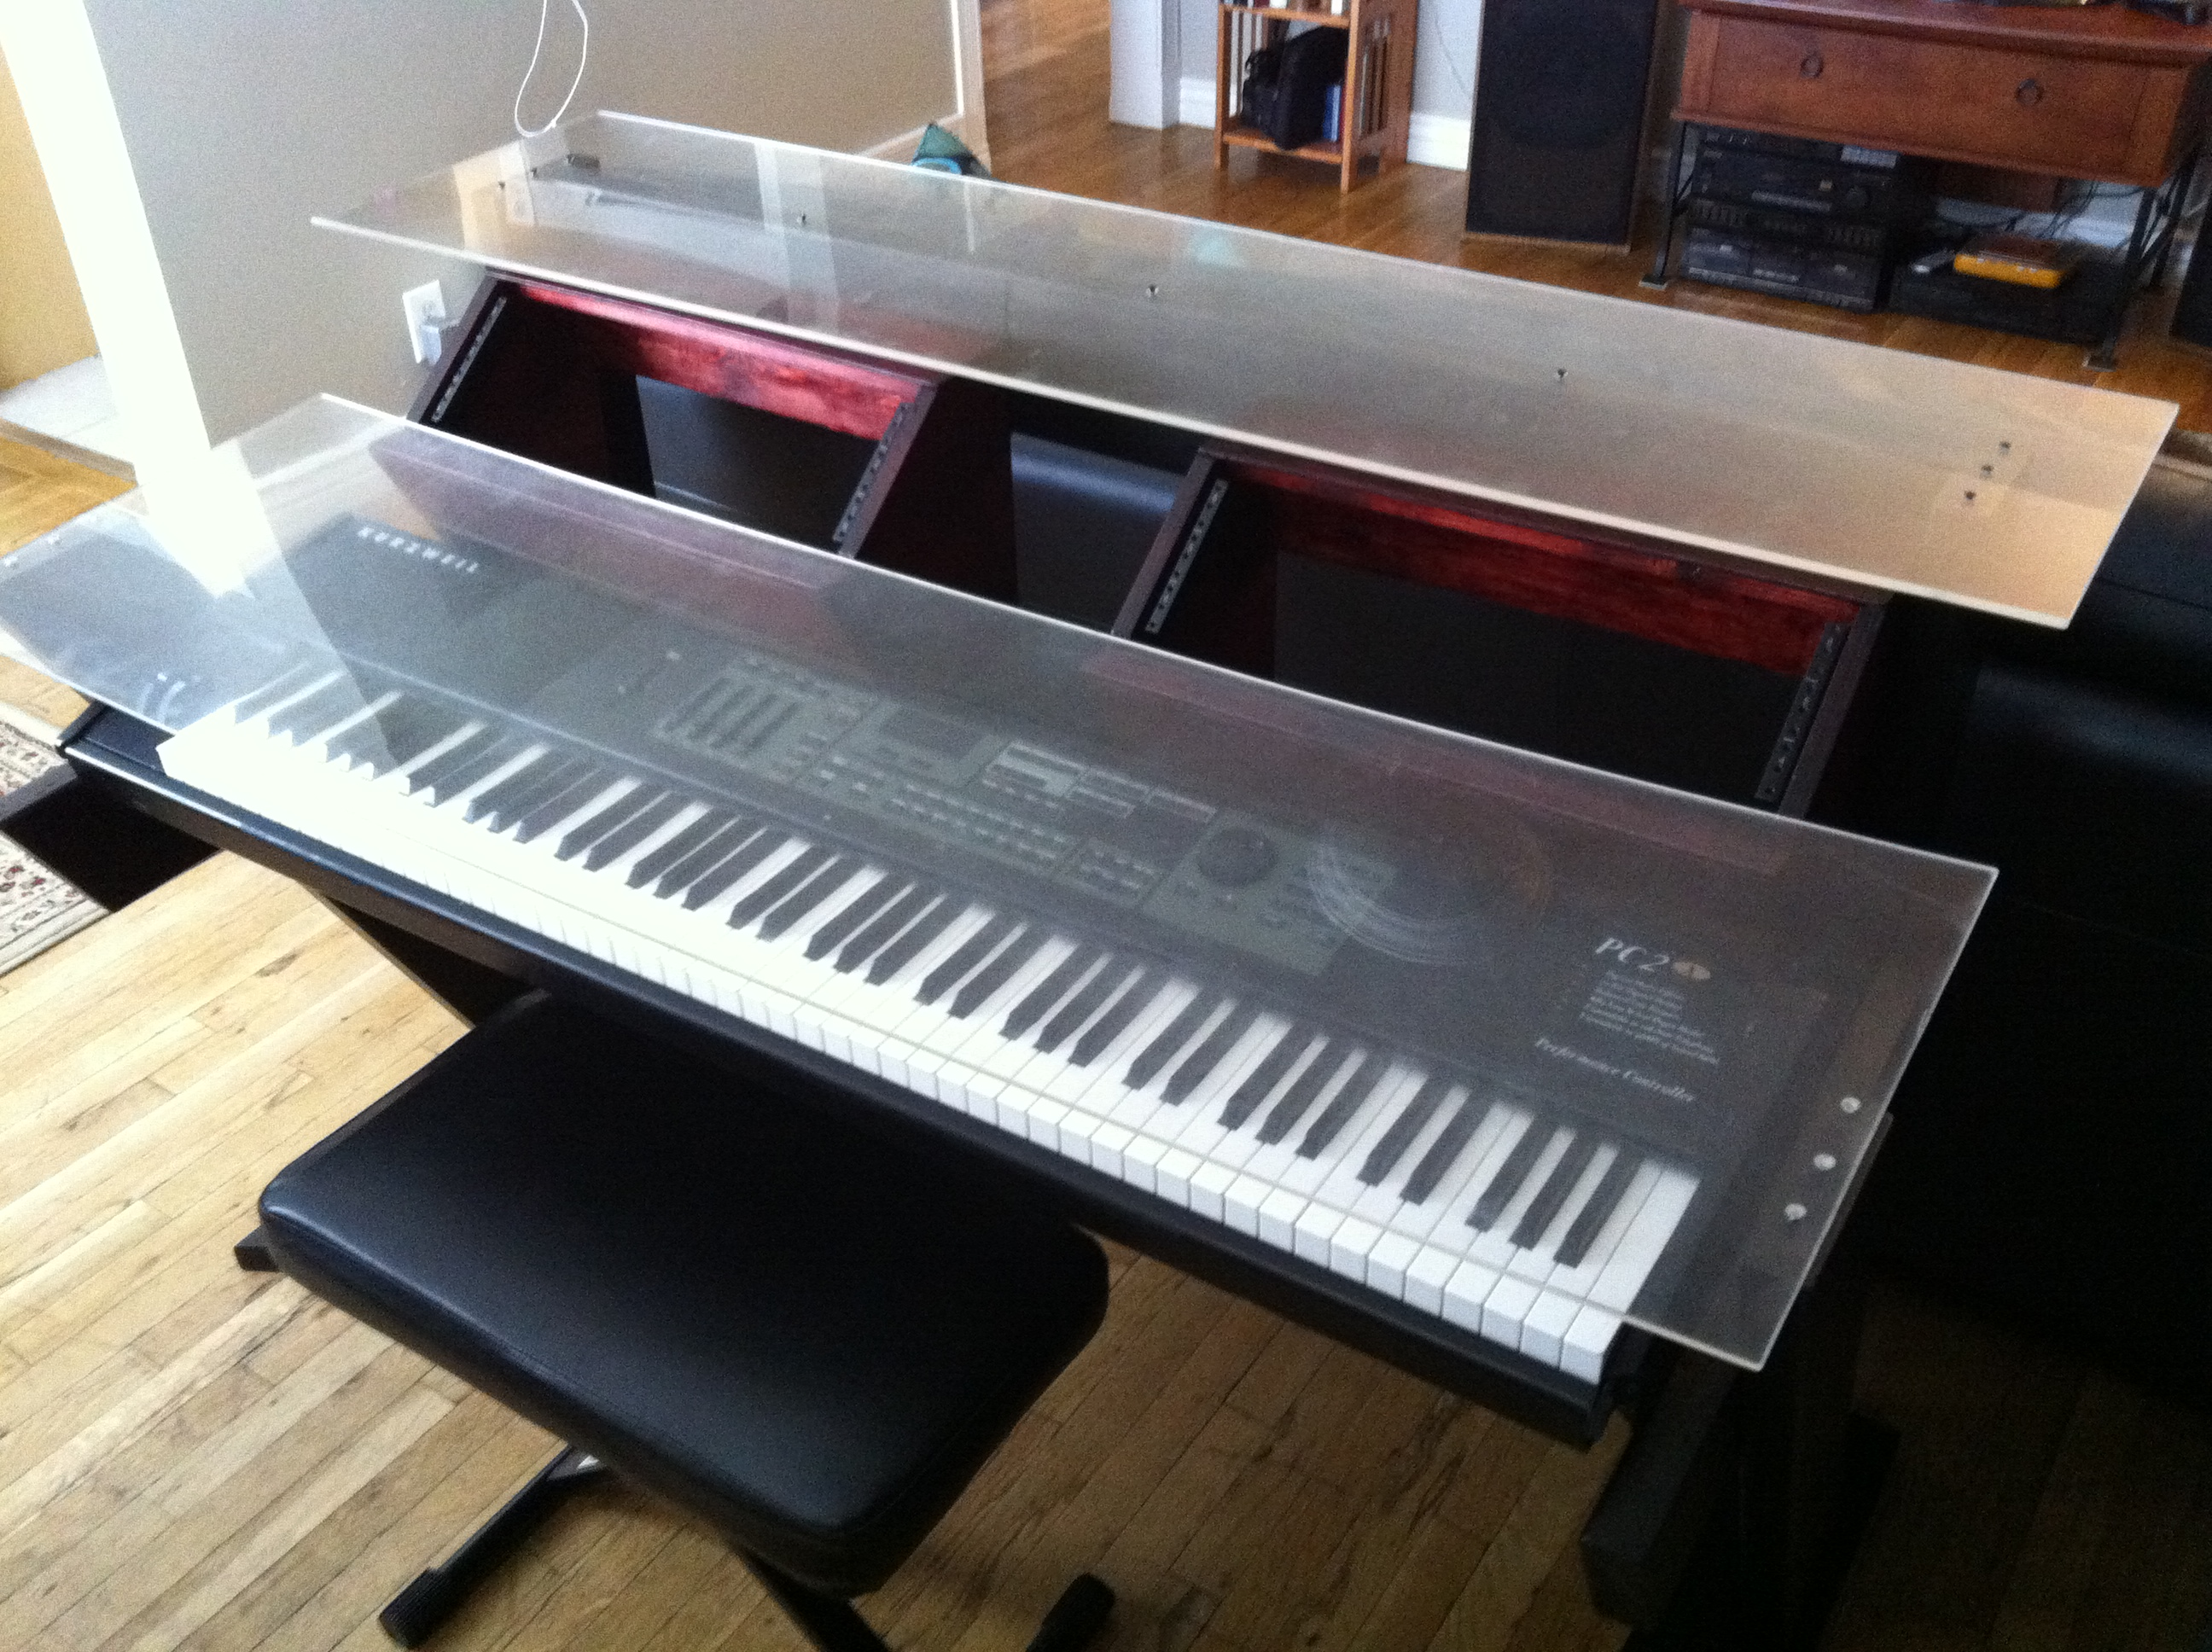 Diy Studio Desk Keyboard Workstation Under 100 Page 2 Gearz